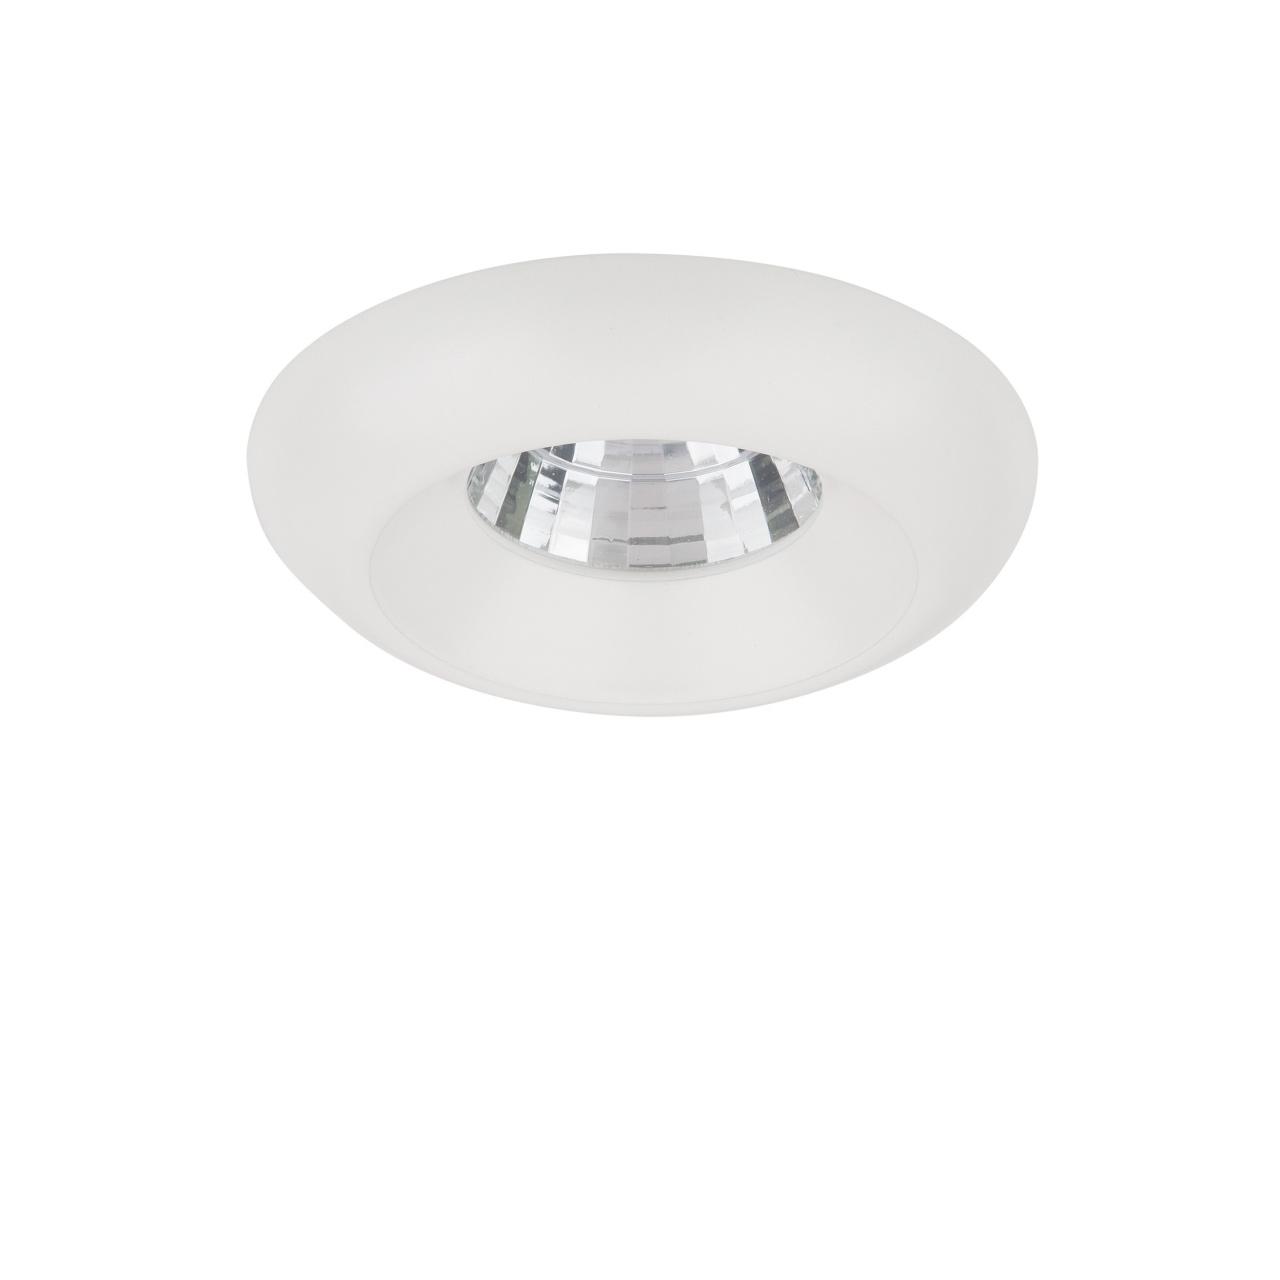 Светильник Monde LED 5W 400LM 50G белый 4000K Lightstar 071156